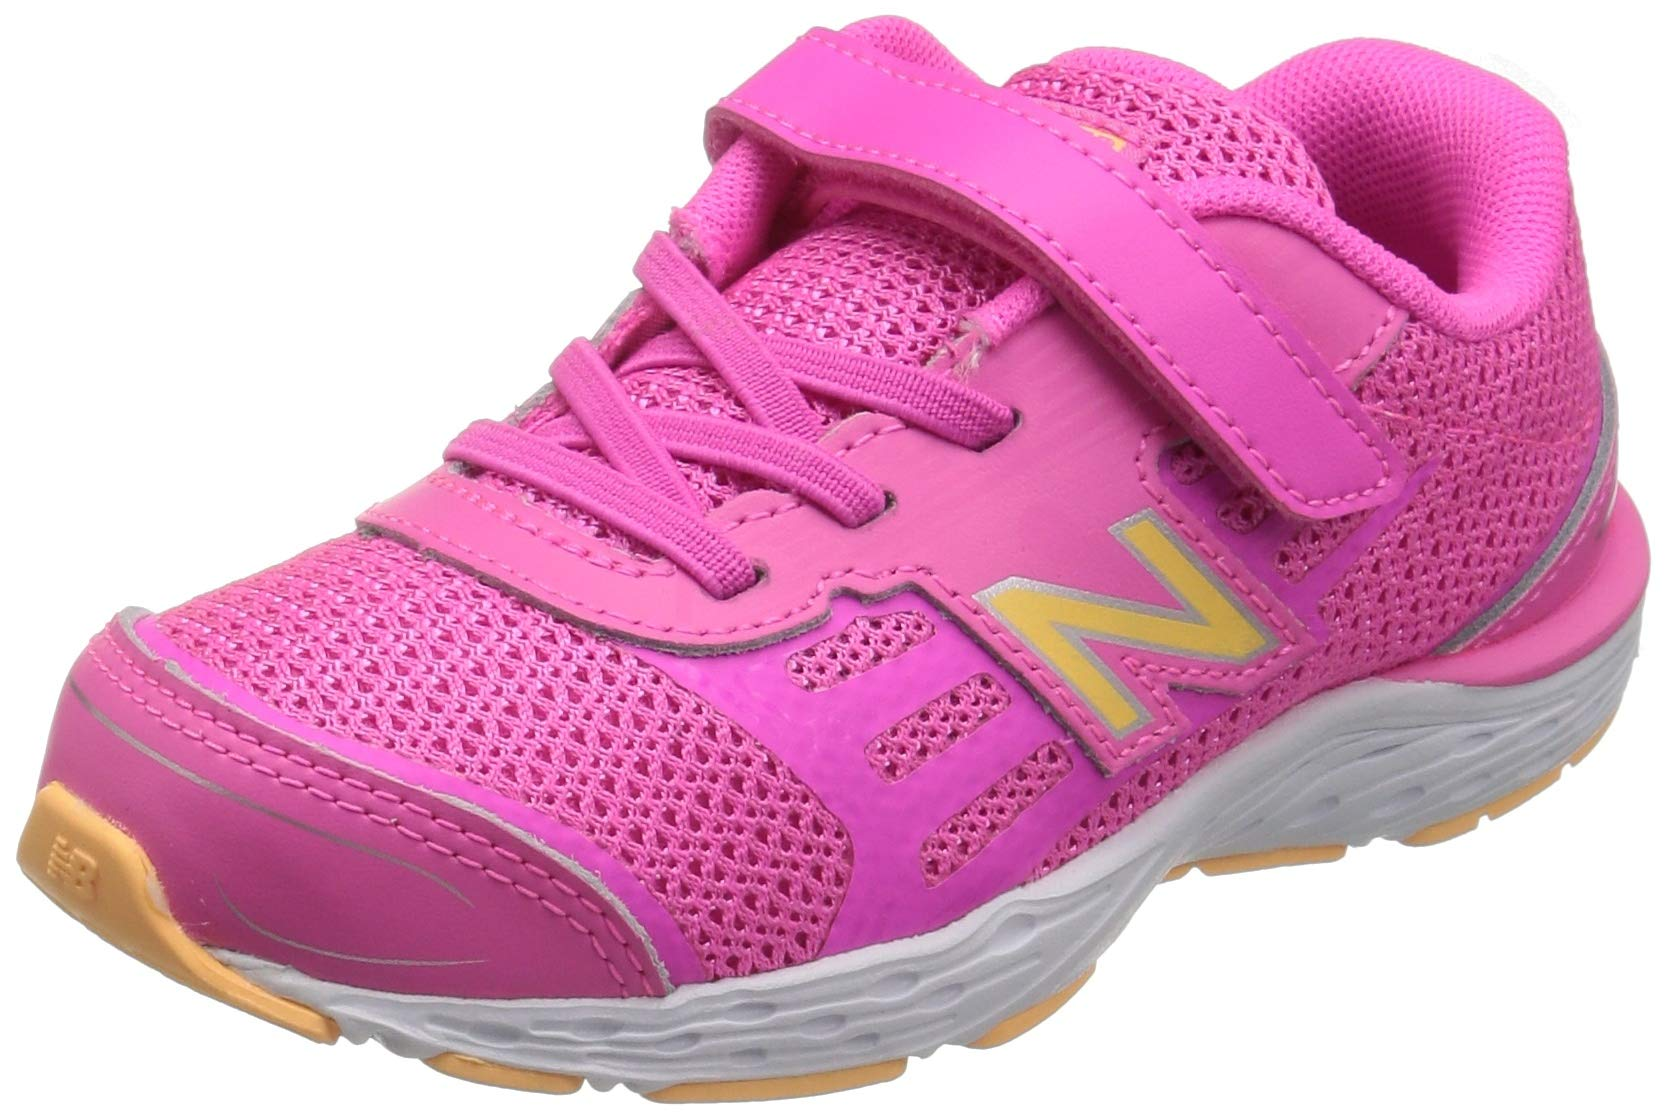 New Balance Girls' 680v5 Hook and Loop Running Shoe, Light Peony/Light Mango, 2 M US Infant